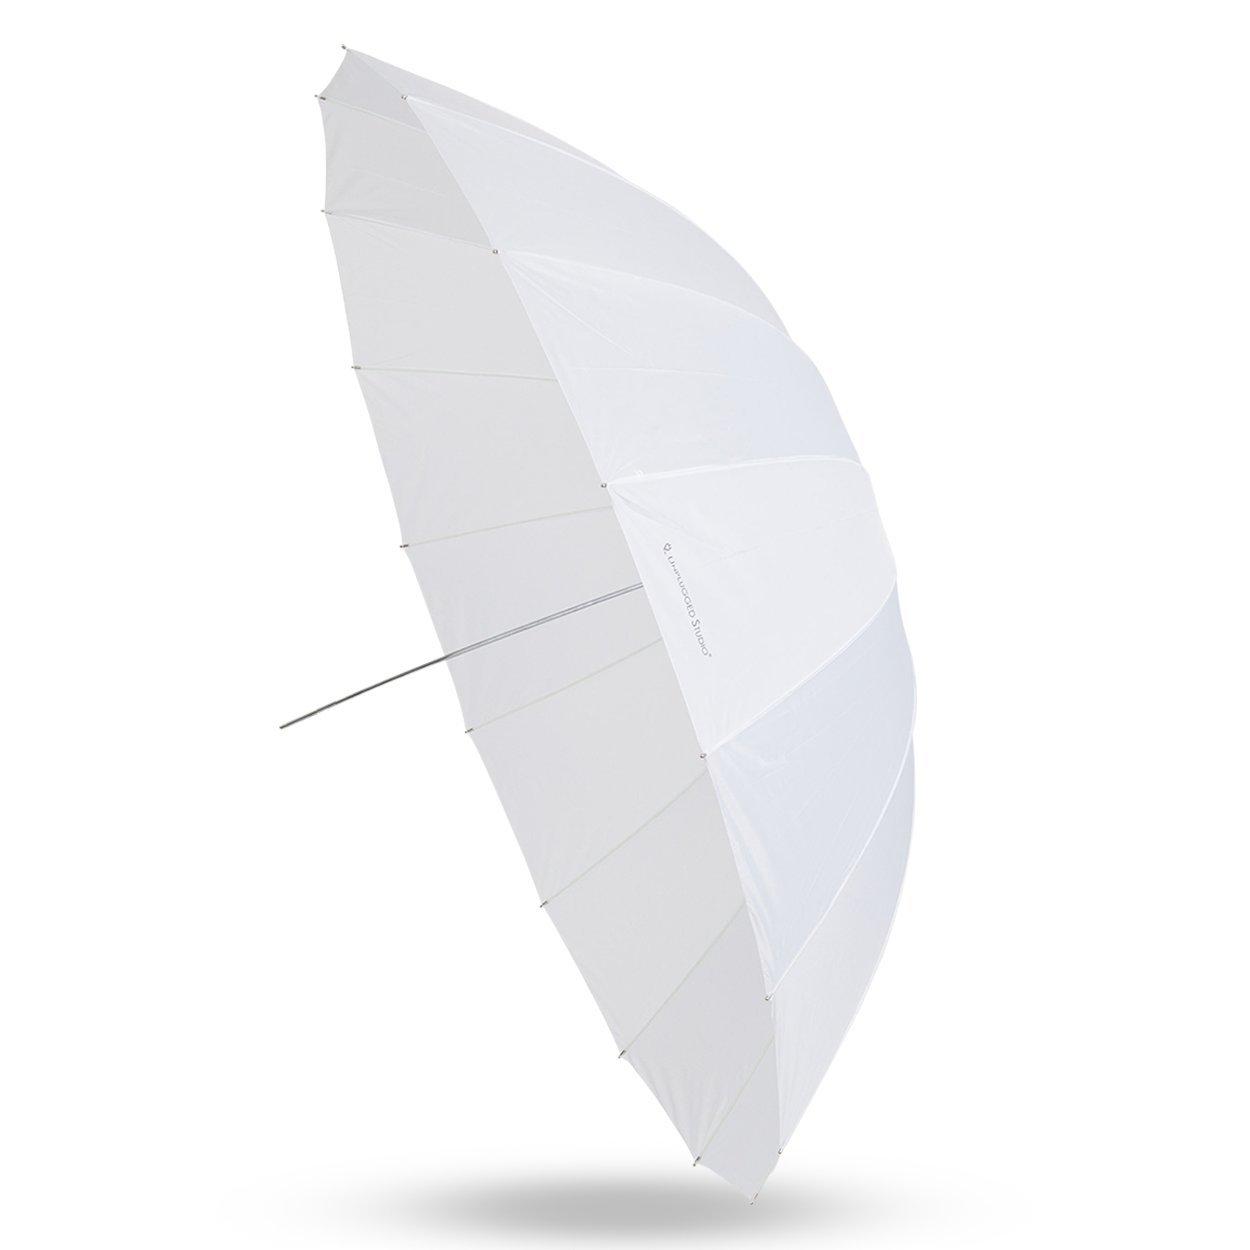 UNPLUGGED STUDIO 70inch Translucent Umbrella (16 Fiberglass Ribs) by UNPLUGGED STUDIO (Image #1)